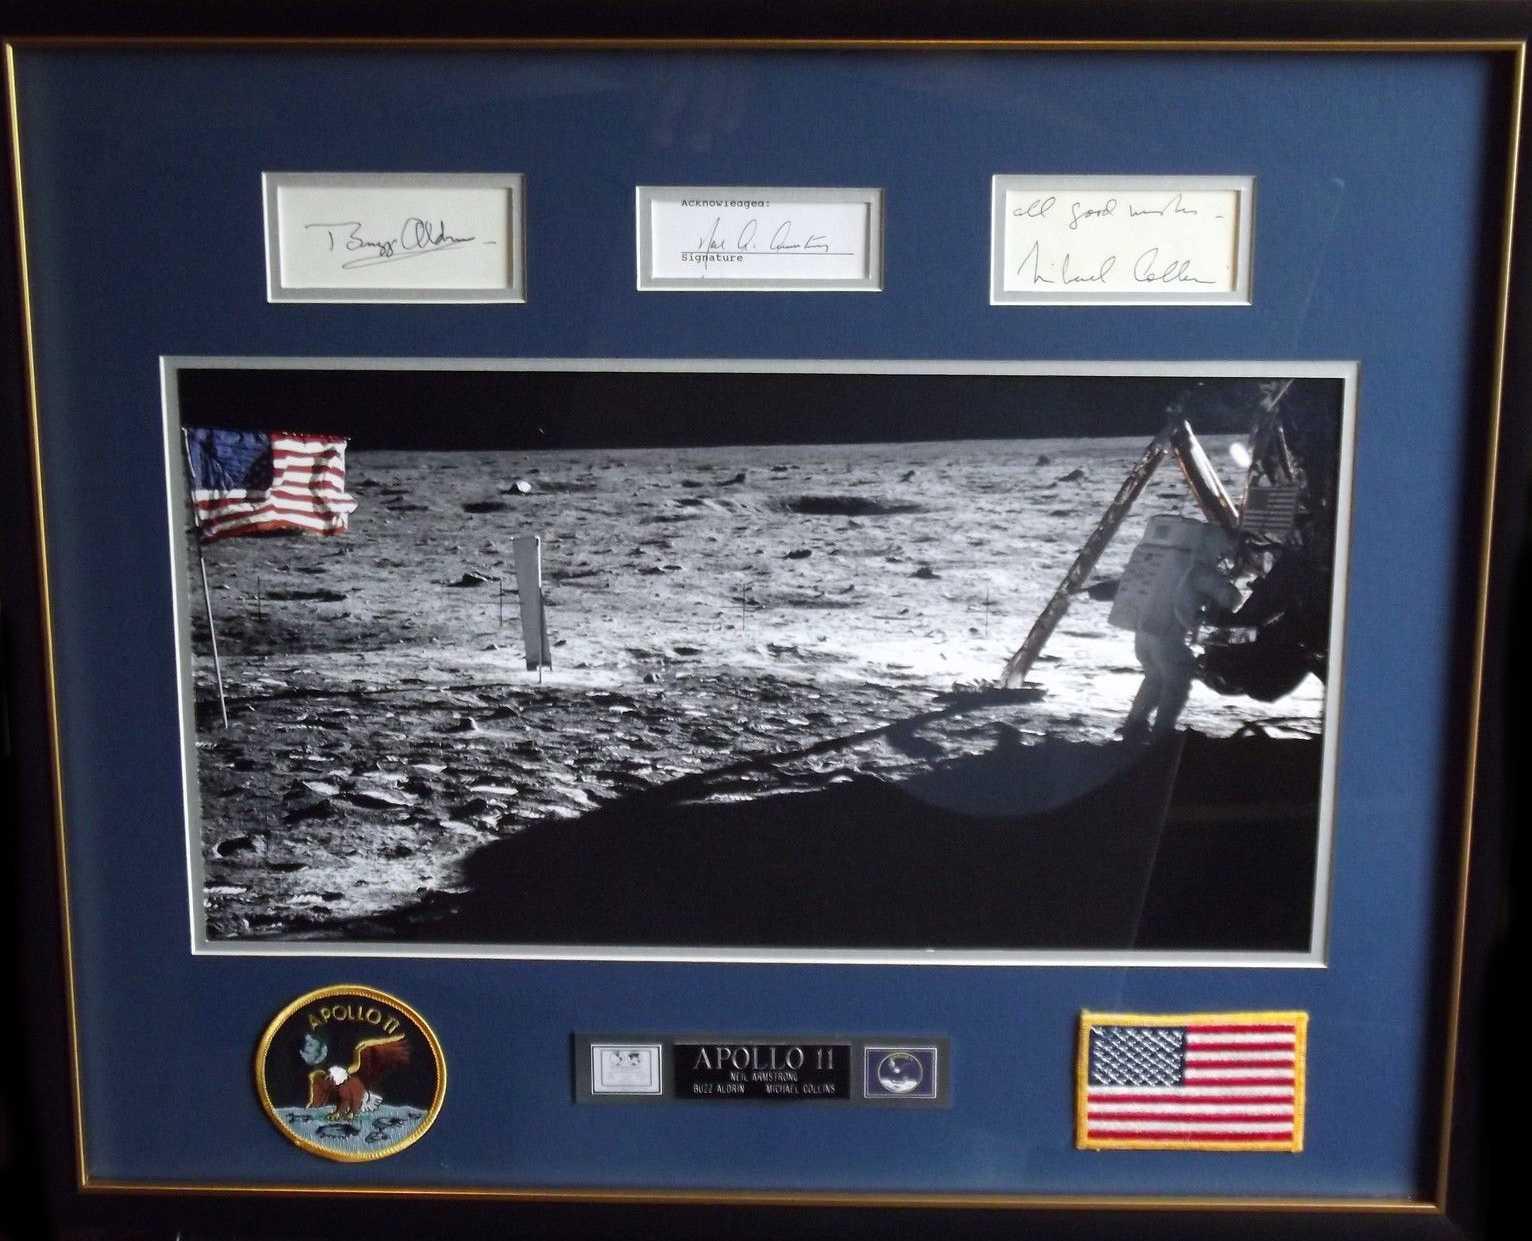 Apollo 11 signature display